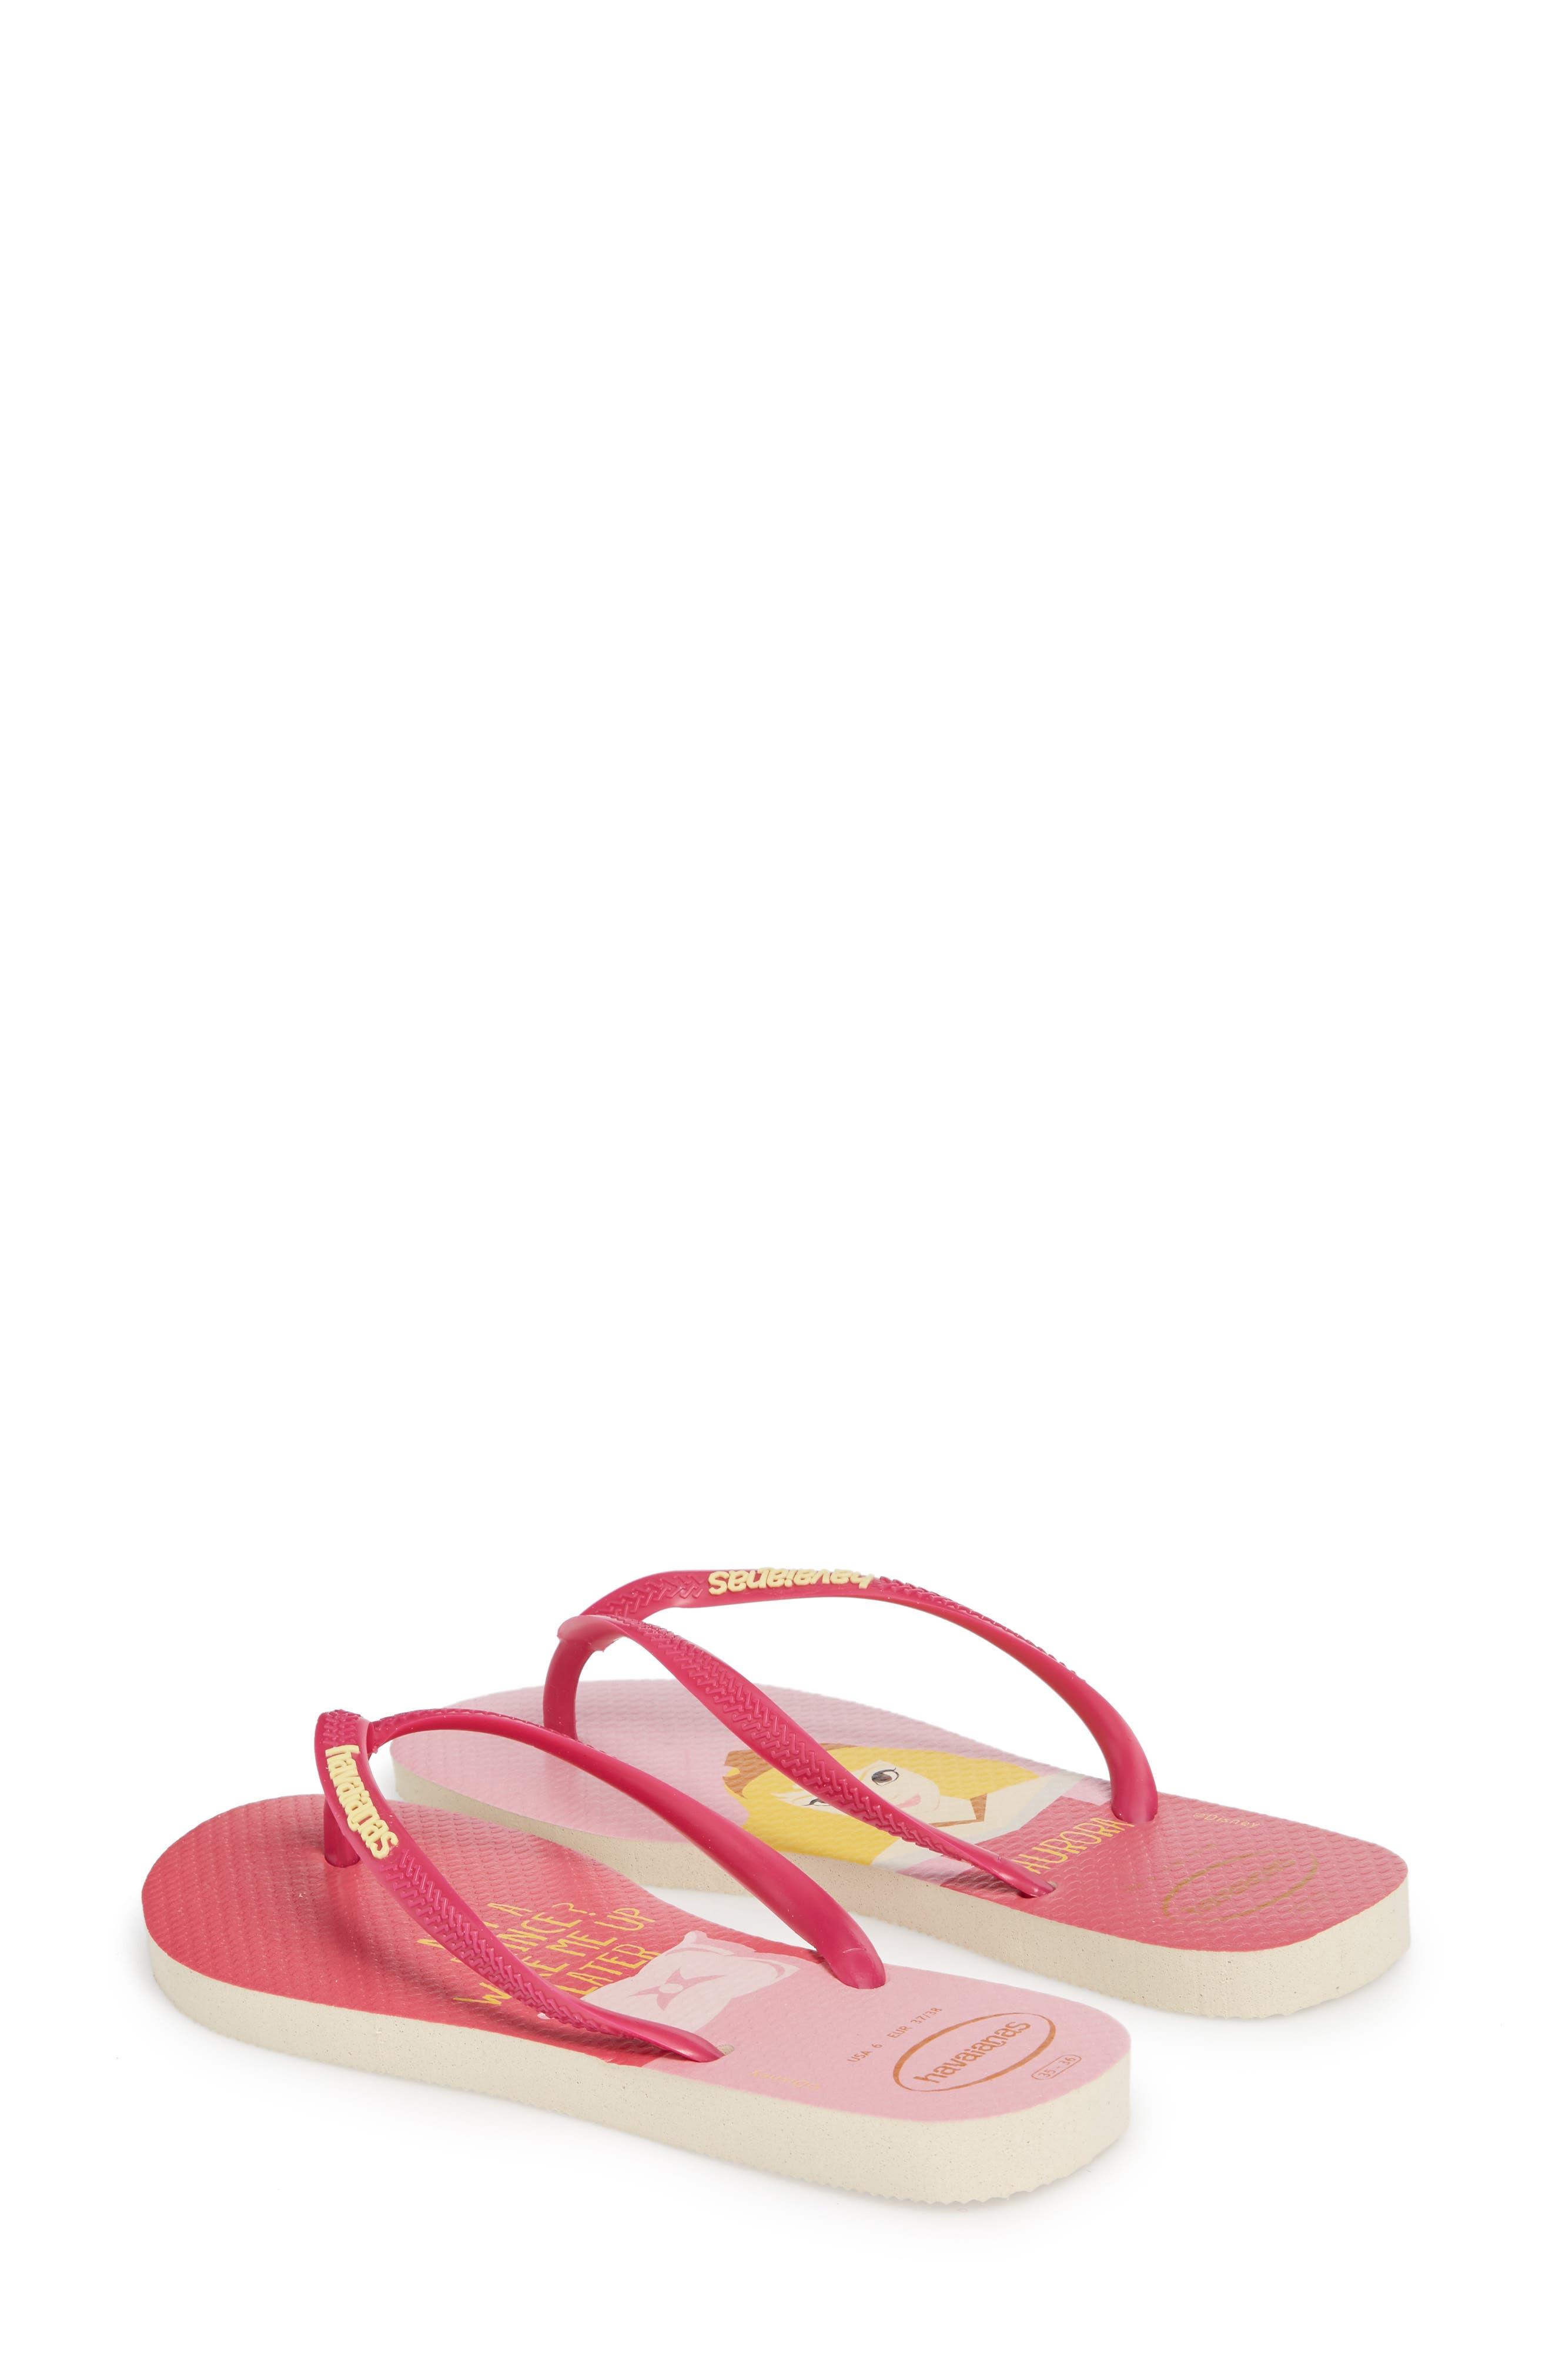 Havaiana Slim - Disney Princess Flip Flop,                             Alternate thumbnail 2, color,                             Beige/ Pink